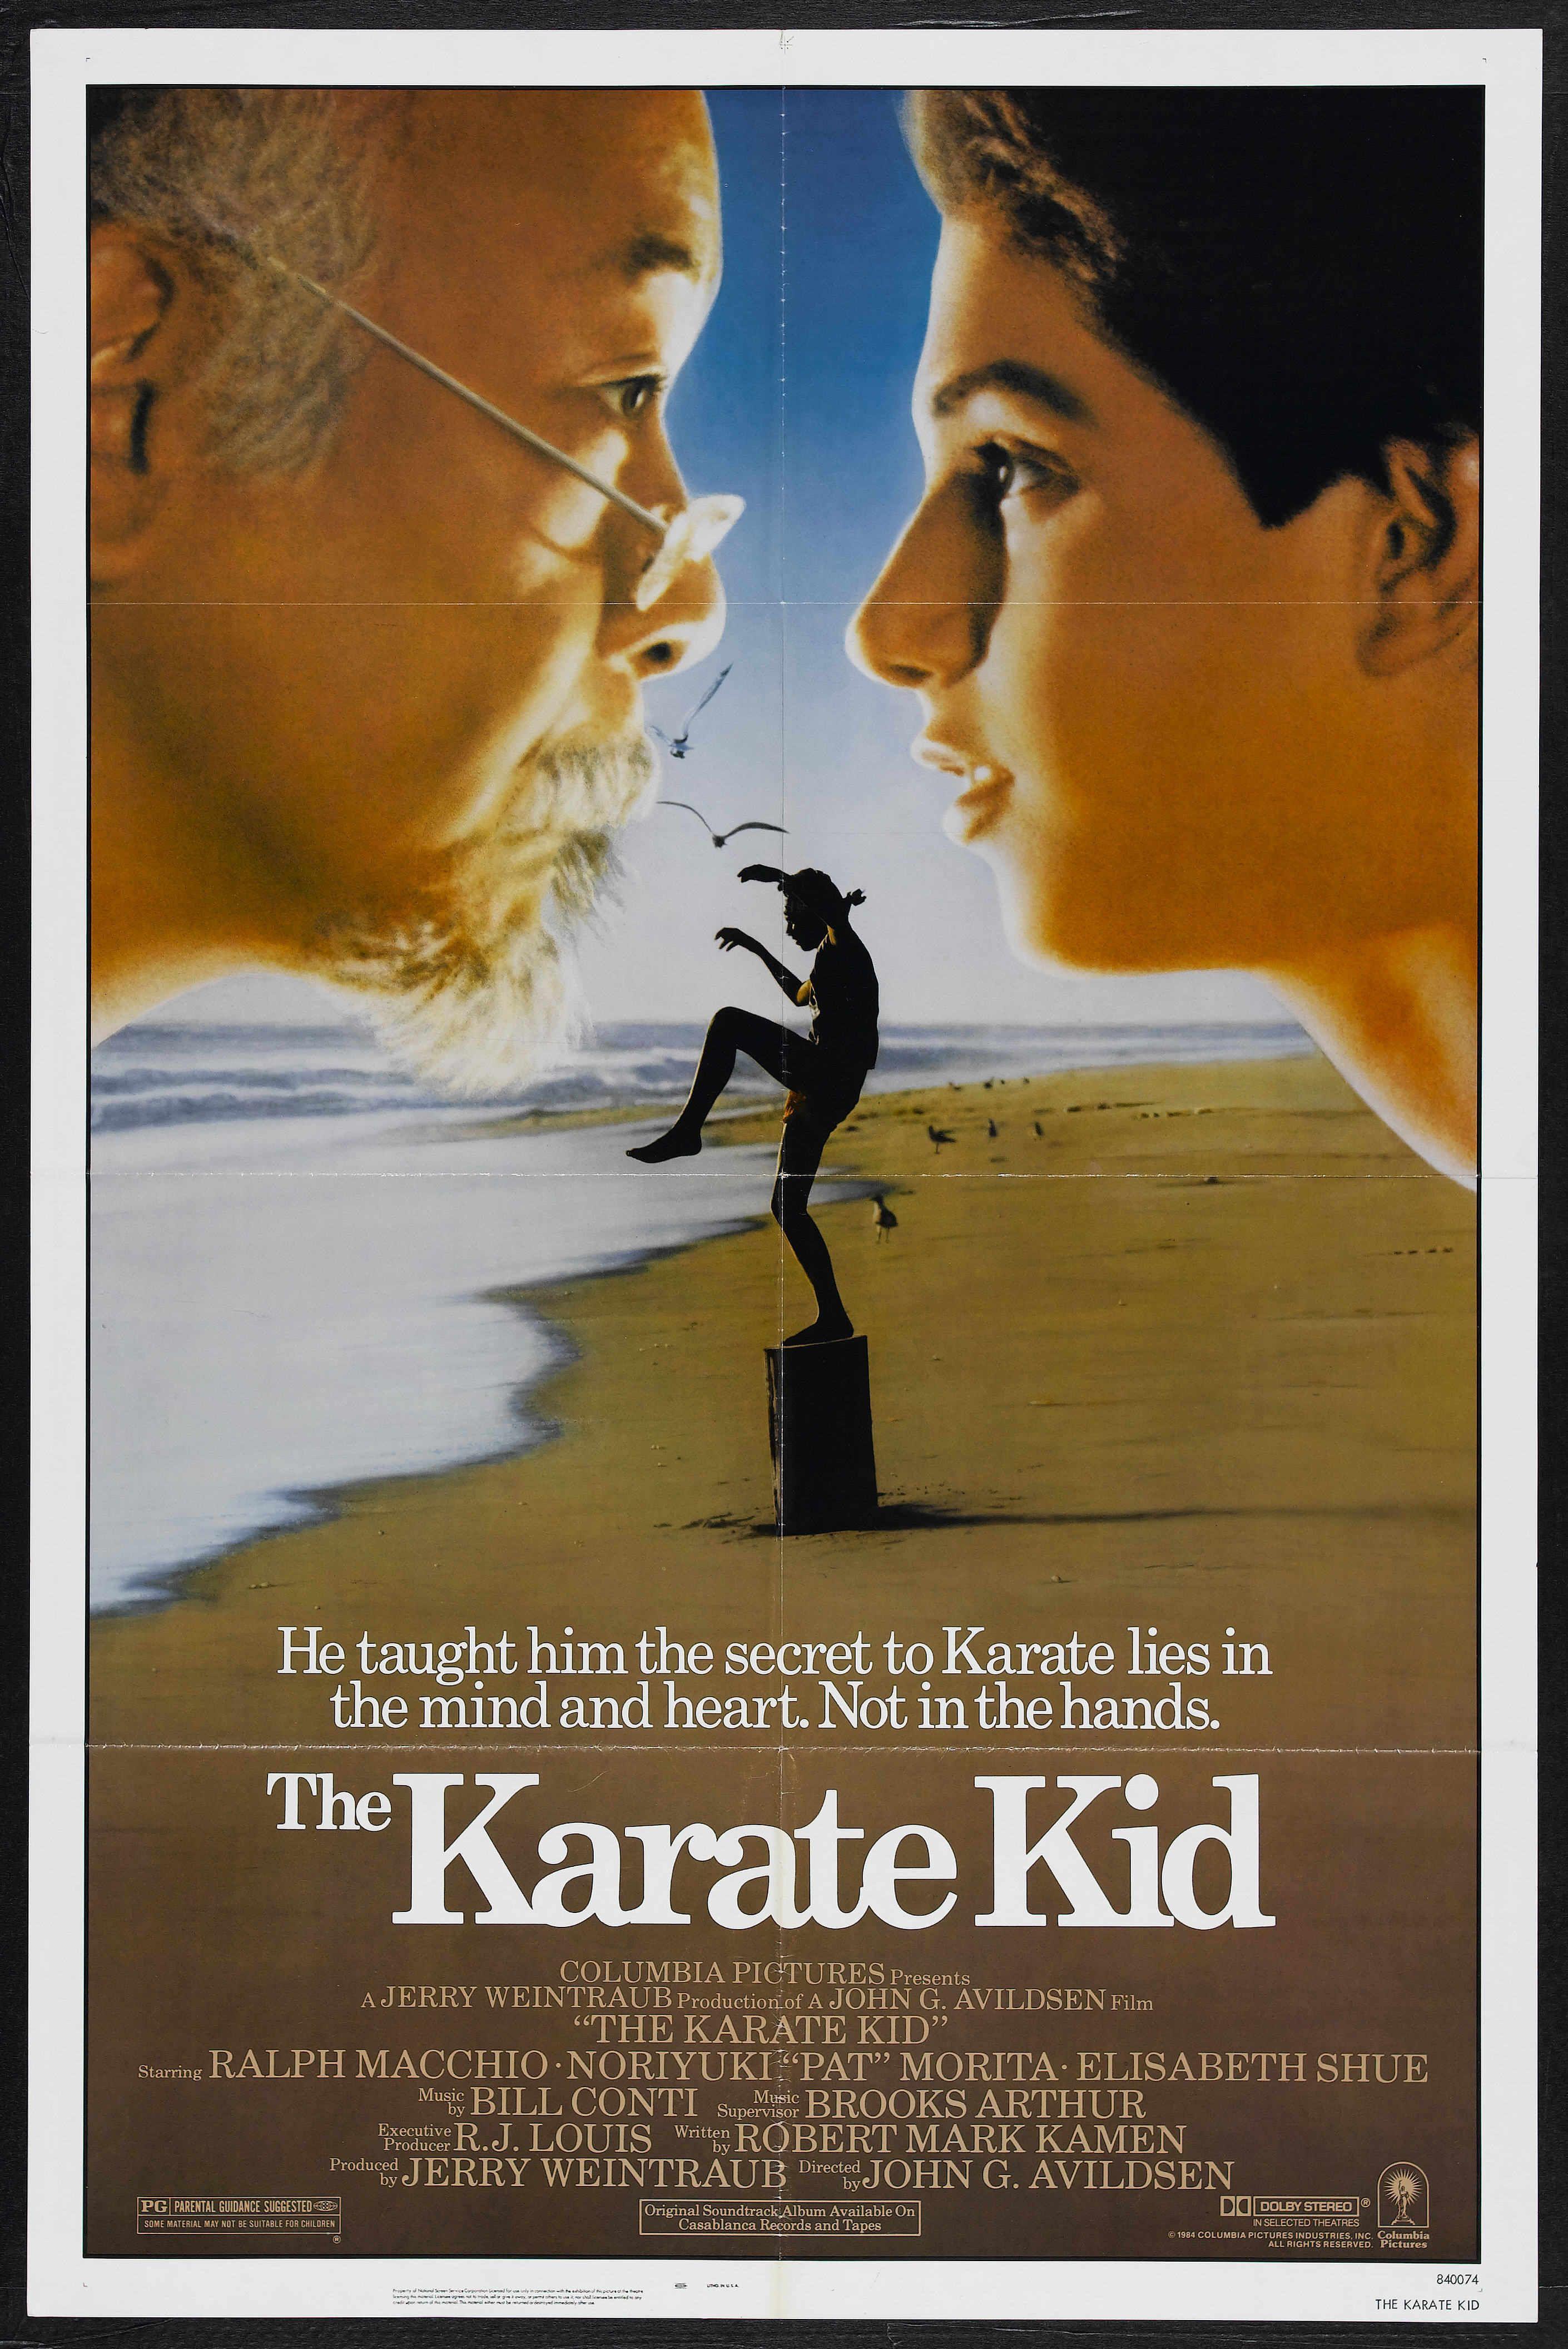 Una Pagina De Cine 1984 Karate Kid Ing 01 Jpg Kids Movie Poster Karate Kid Movie Kid Movies